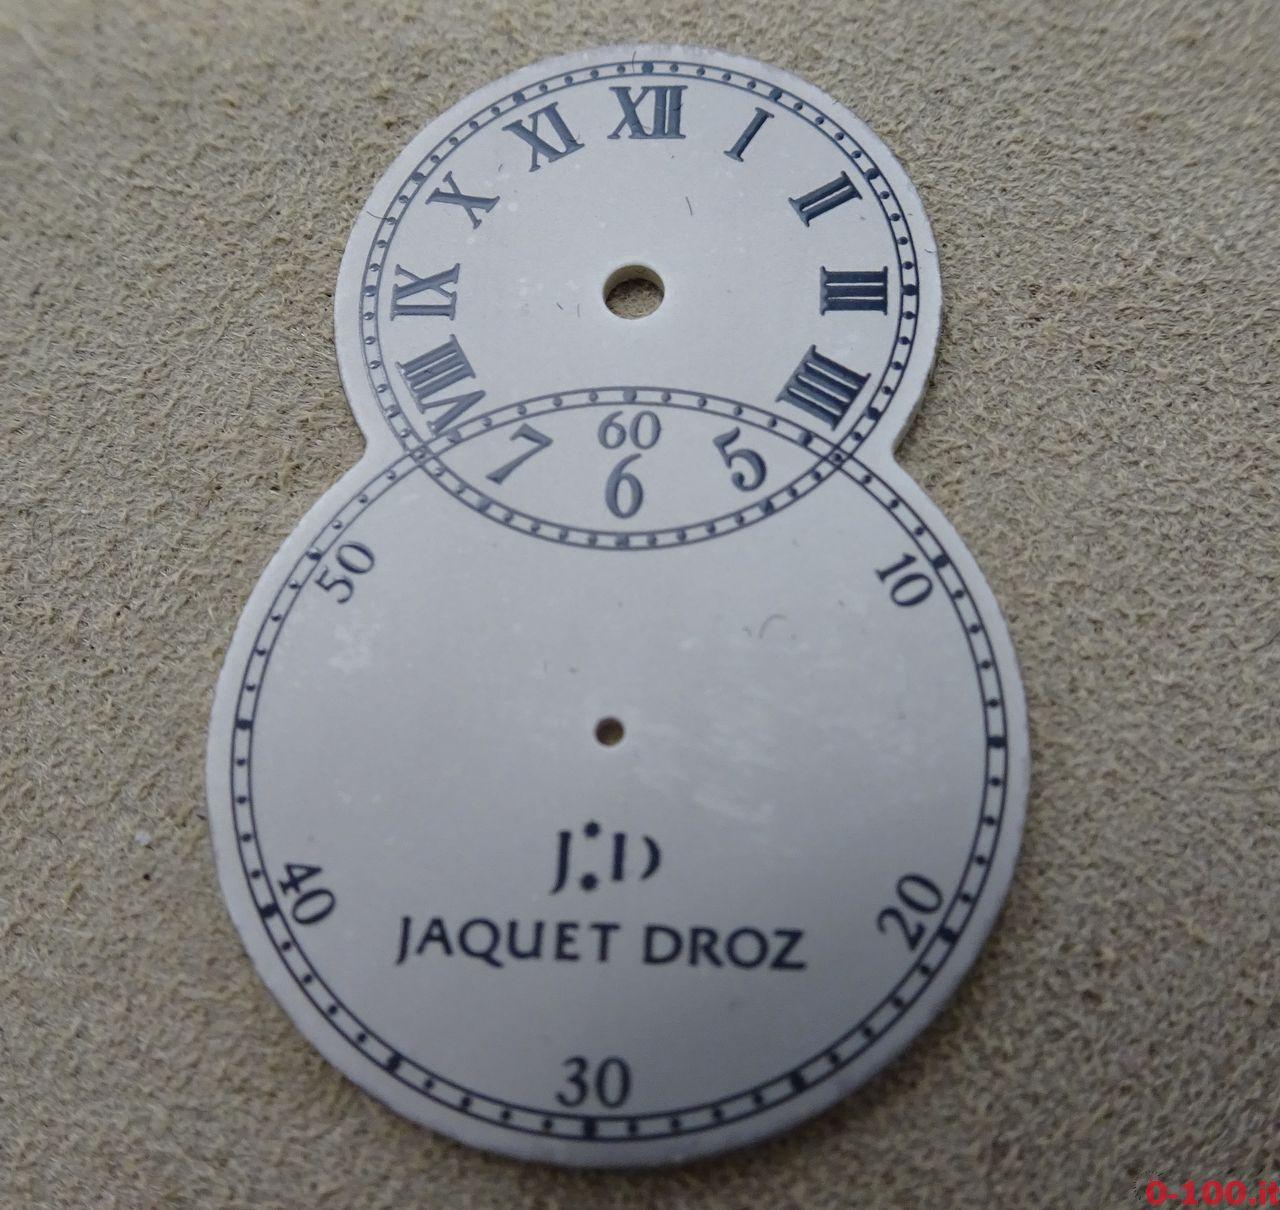 gli-speciali-di-0-100-it-jaquet-droz-la-manifattura-di-la-chaux-de-fonds_0-10038